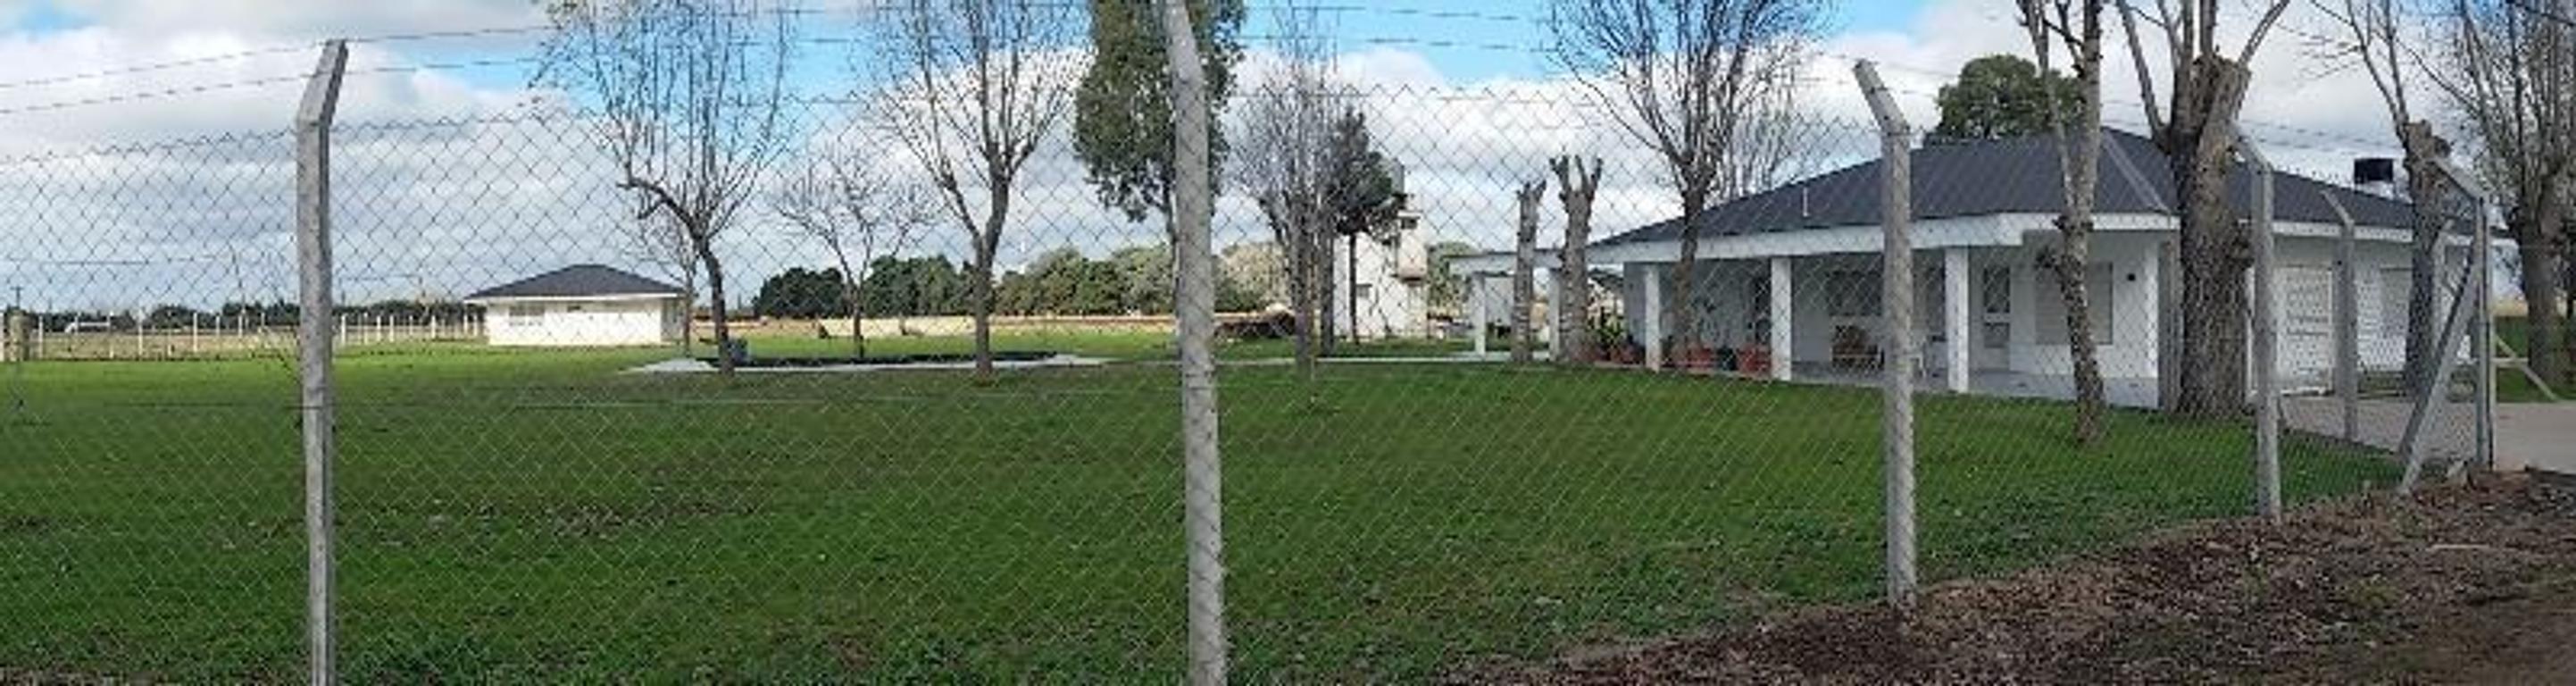 VENDO CAMPO 30 has. Ruta 2 Km 50 zona autódromo ESCUCHO OFERTA